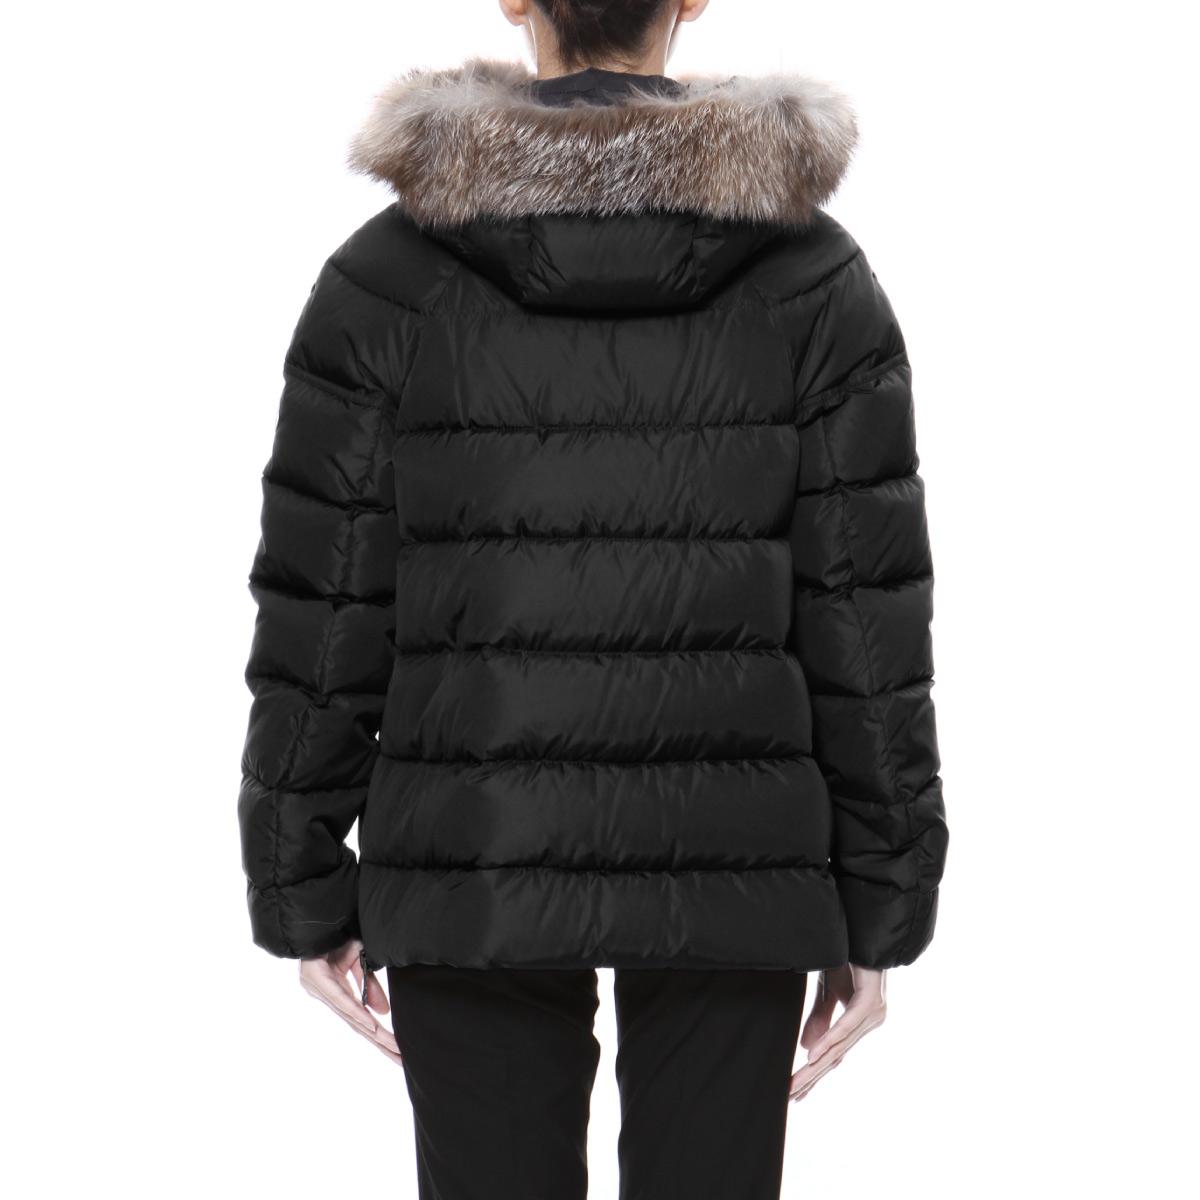 Down jacket CHITALPA チタルパ BLACK black with Monk rail MONCLER outer Lady's CHITALPA 54155 999 fur & food & belt